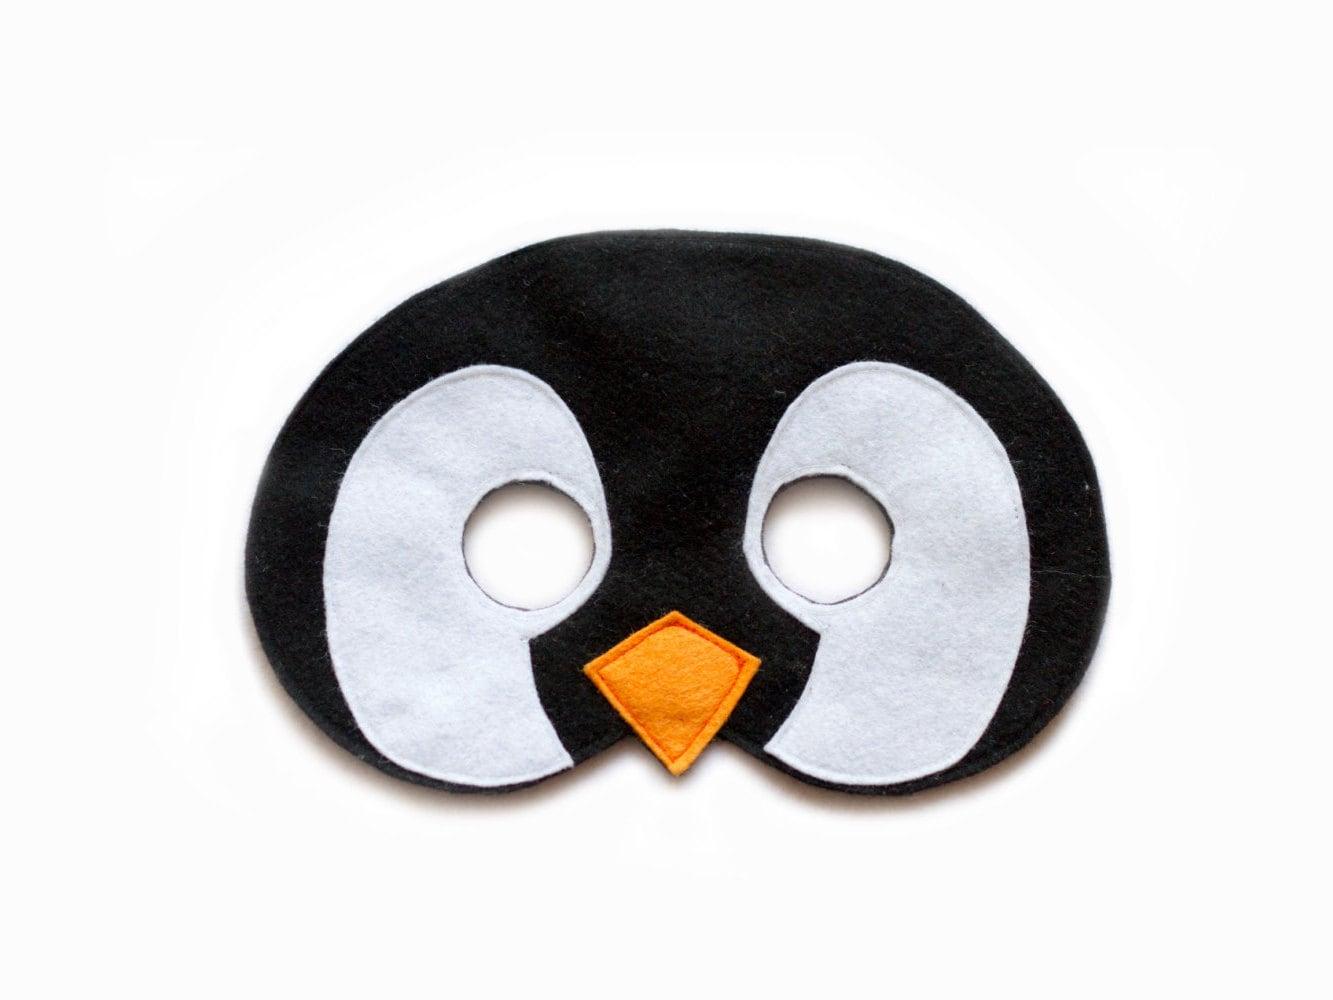 Famoso Patrones De Costura Pingüino Foto - Coser Ideas Para Vender ...